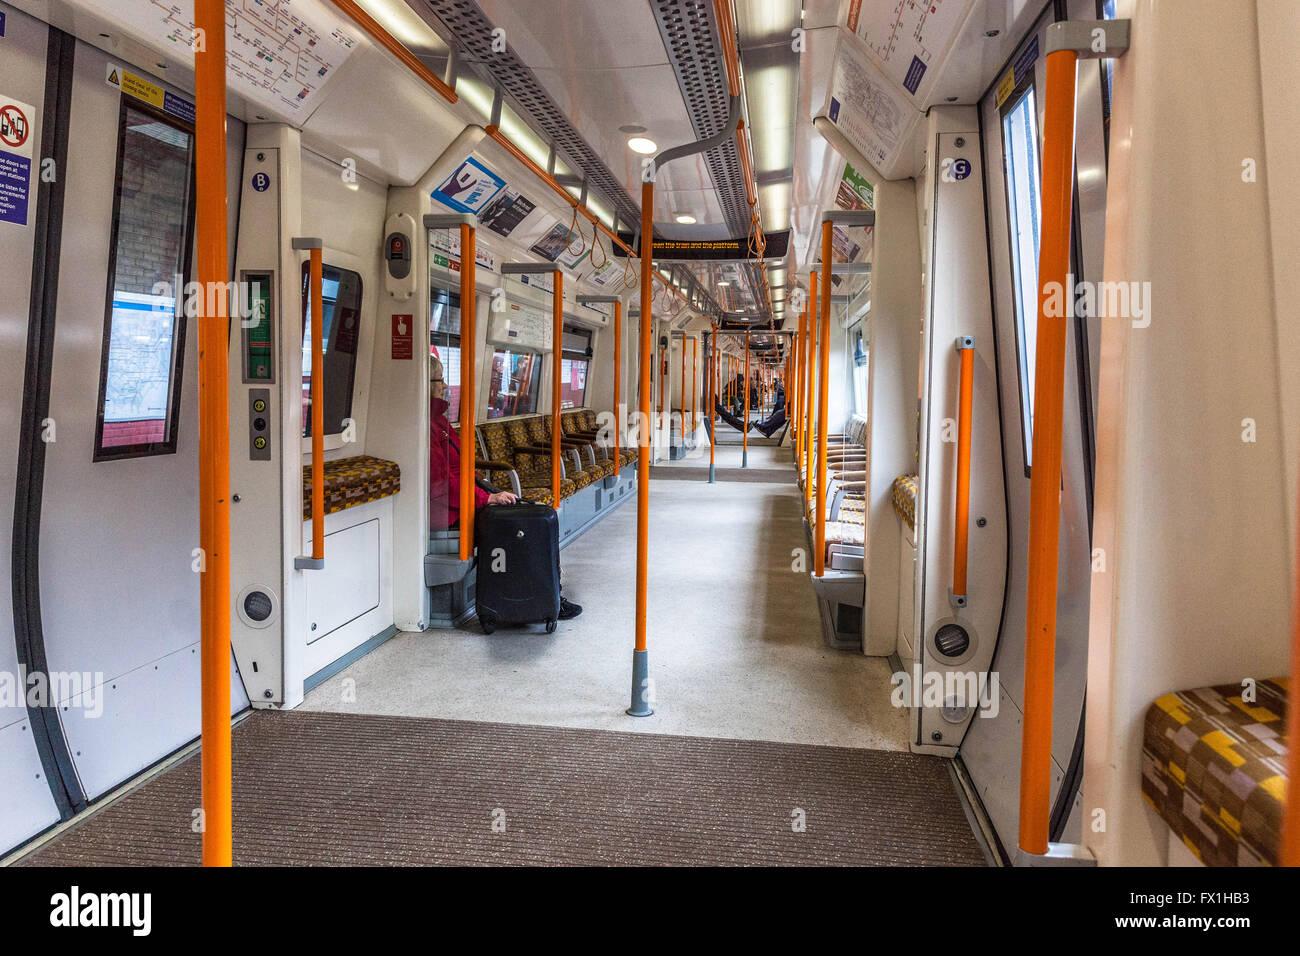 Overground carriage rain interior, London, England, UK - Stock Image